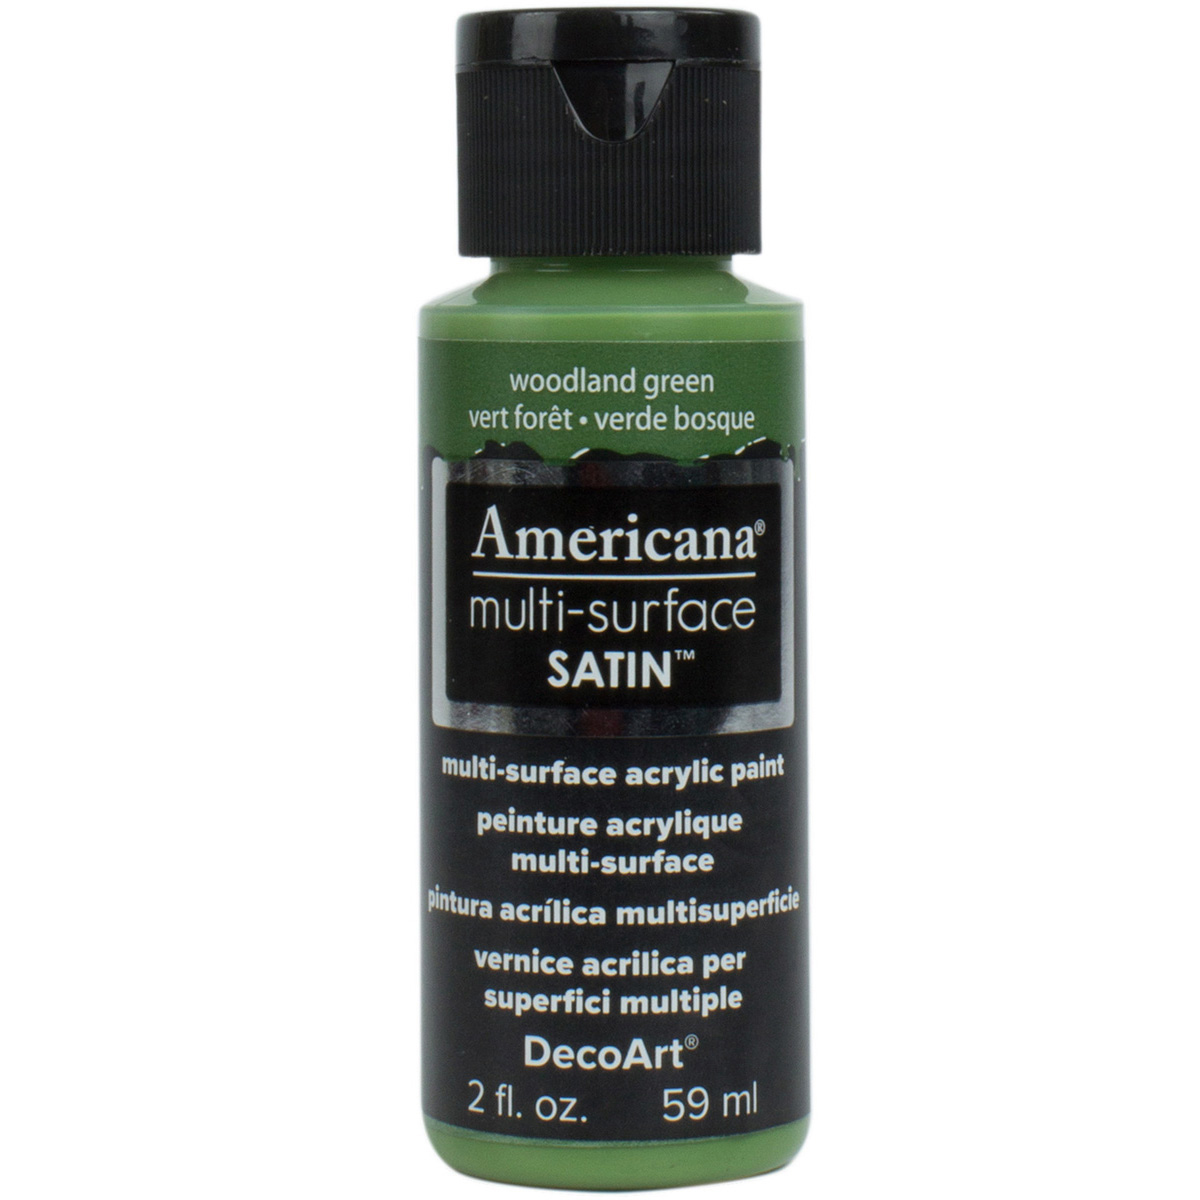 Americana Multi-Surface Satin Acrylic Paint 2oz